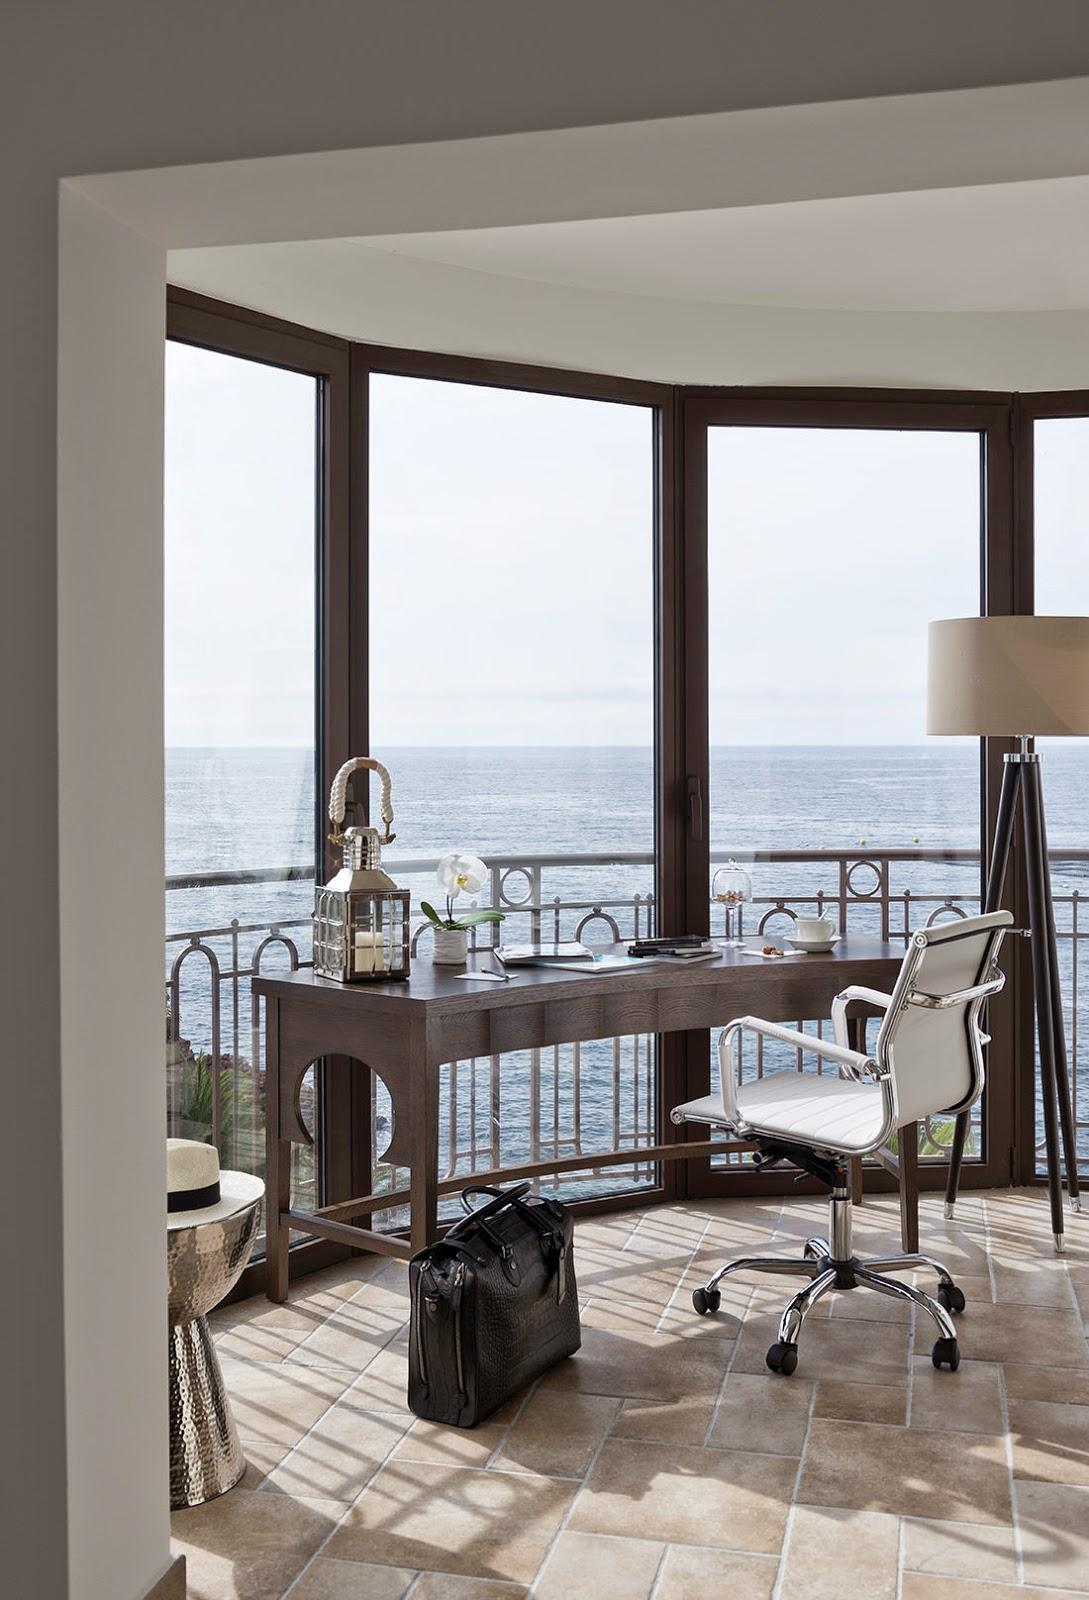 The Tiara Miramar Beach Hotel U0026 Spa, French Riviera   Luxury Interior Home  Design